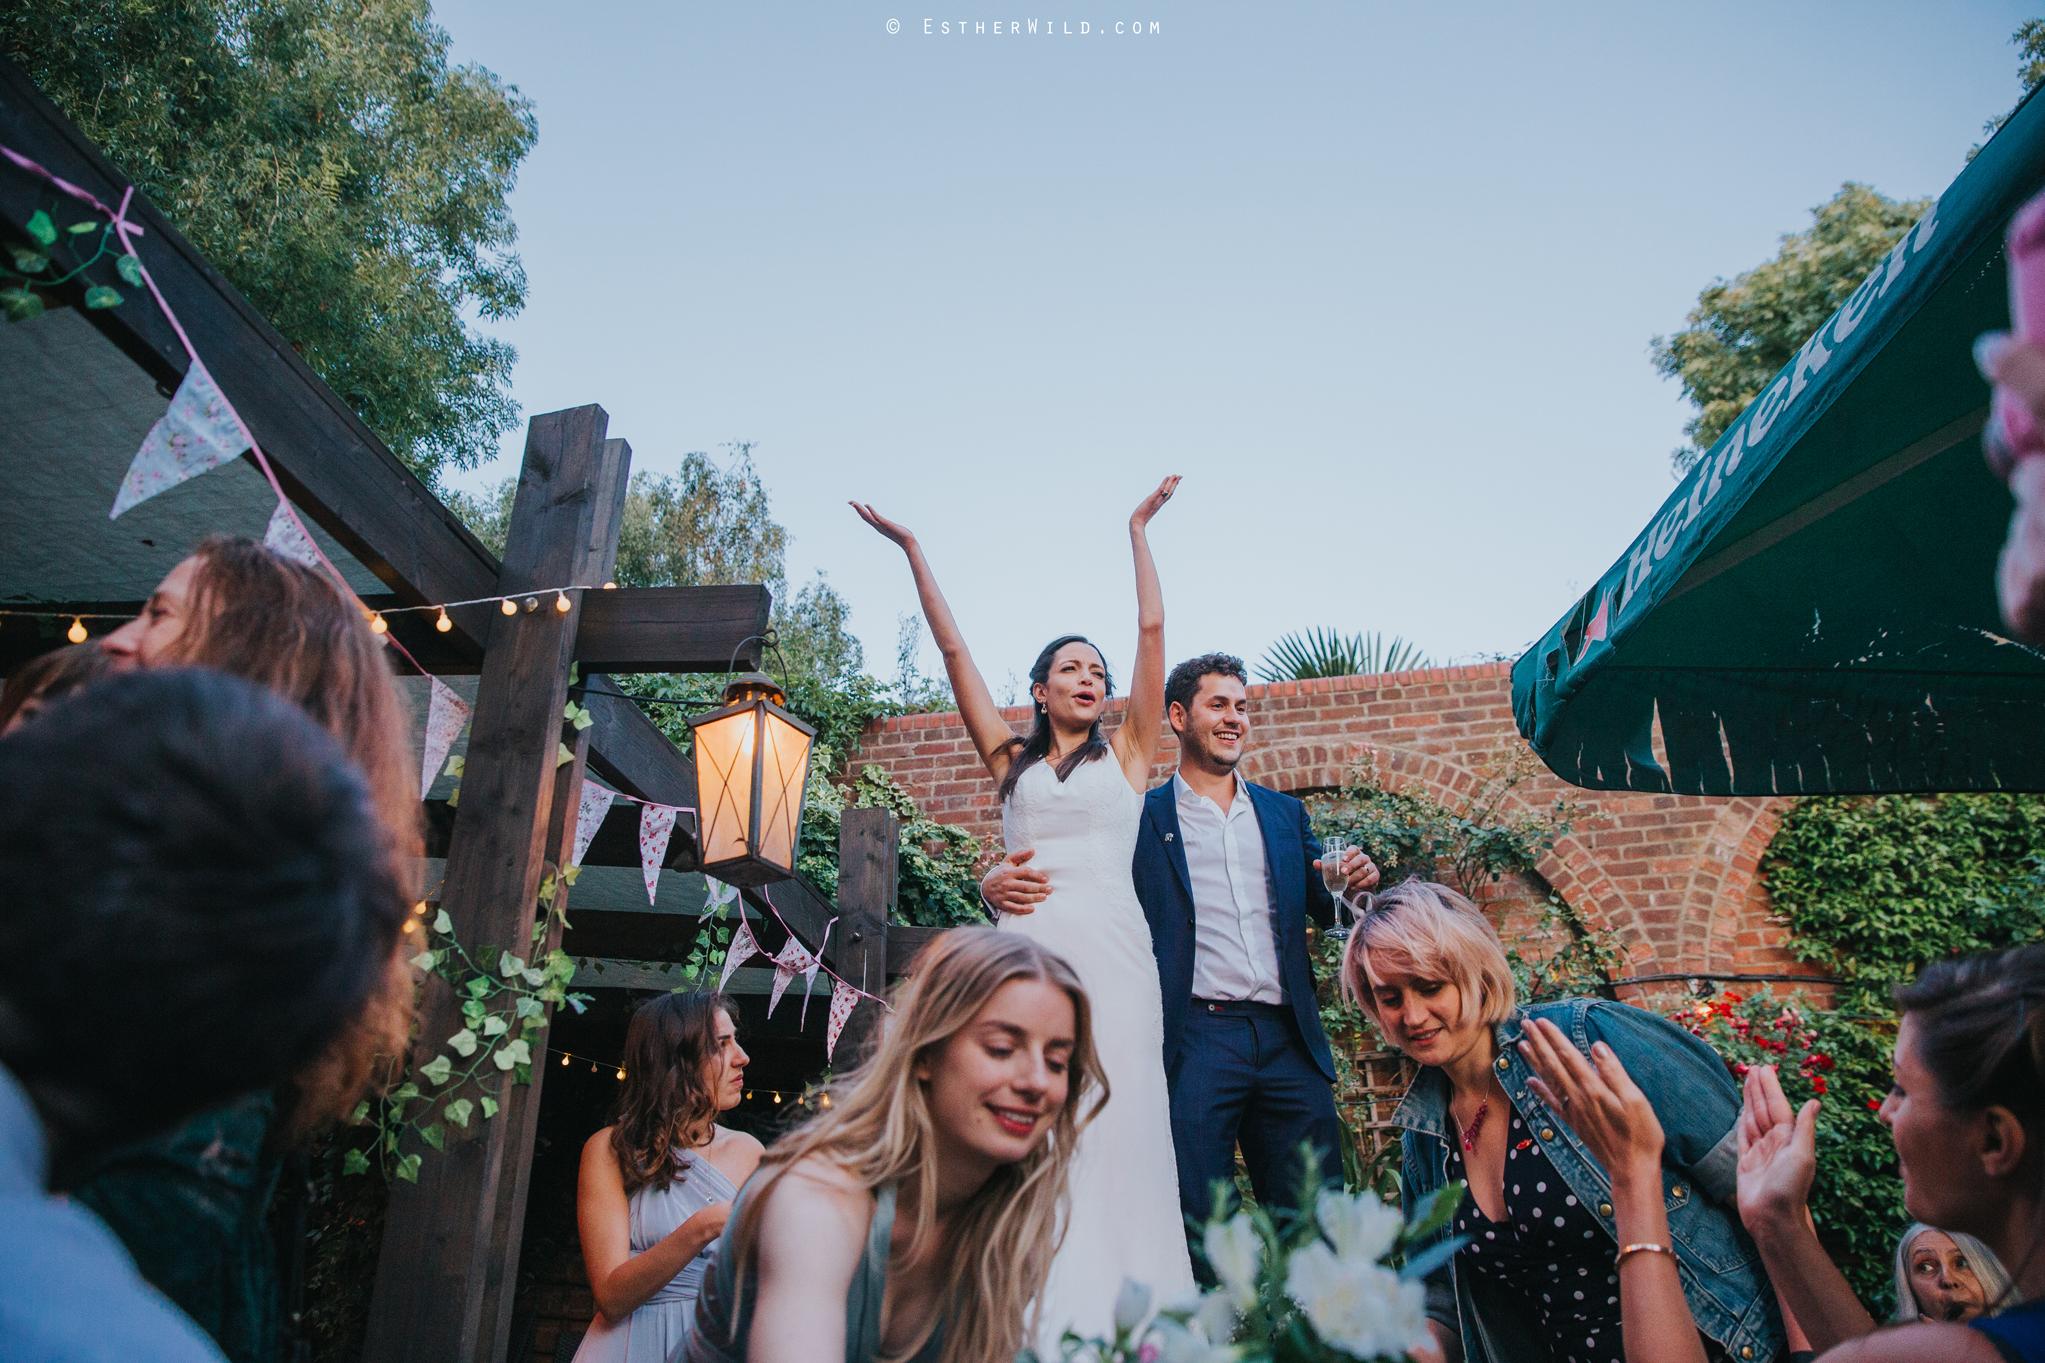 Islington_Town_Hall_Wedding_London_Photographer_Esther_Wild_IMG_7789.jpg